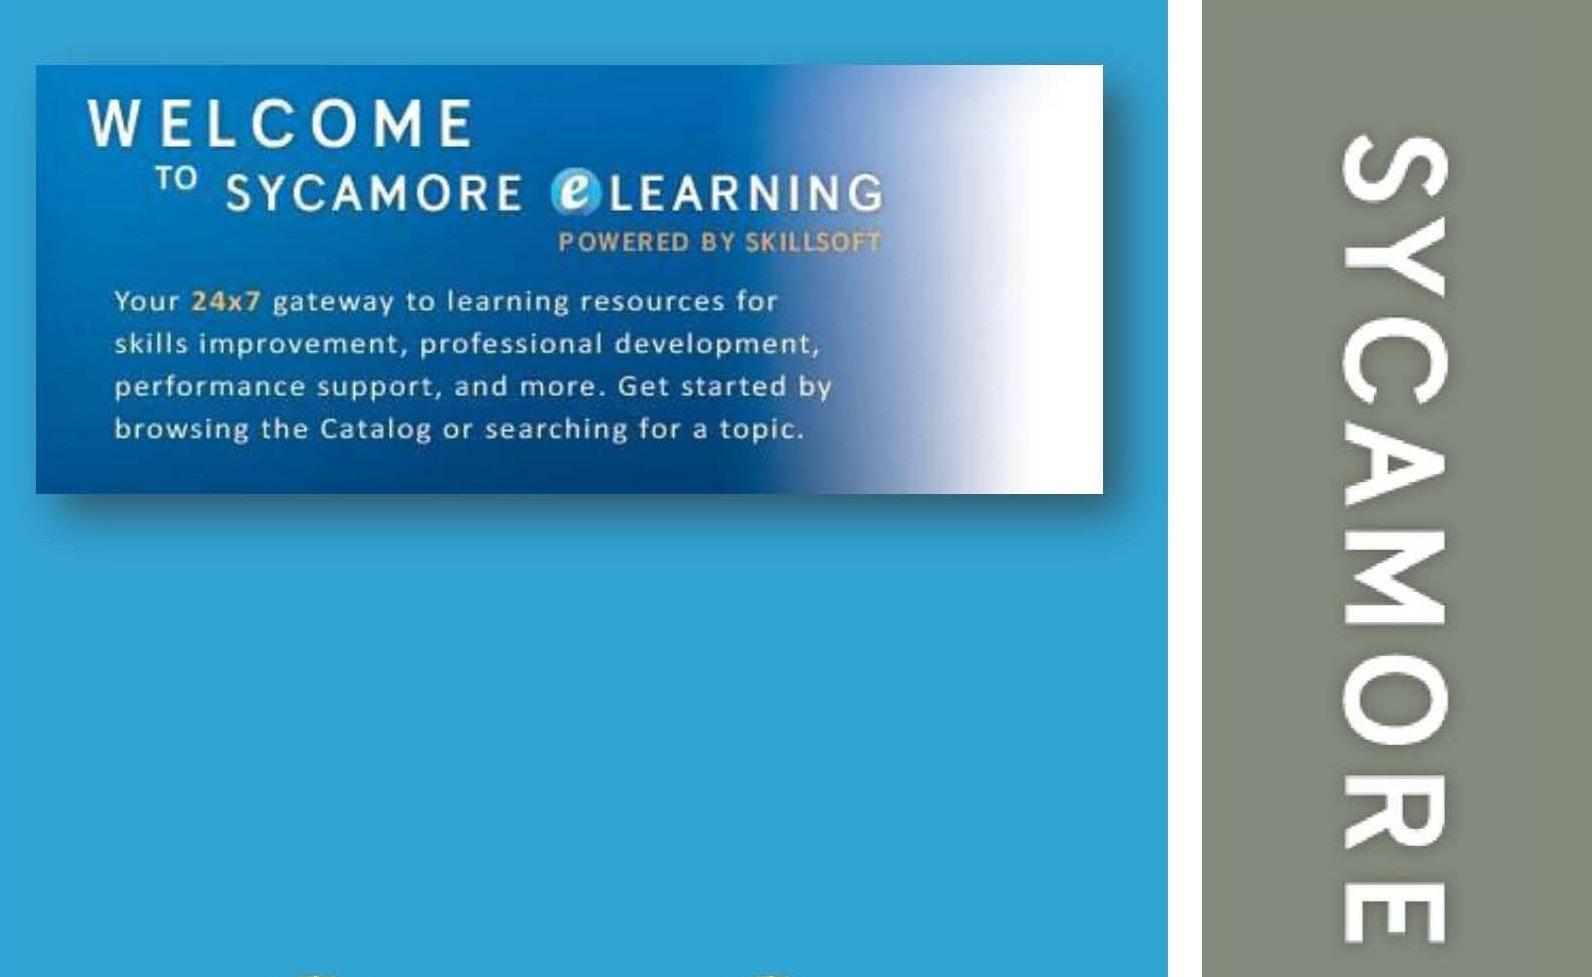 sycamoree_learning.jpg